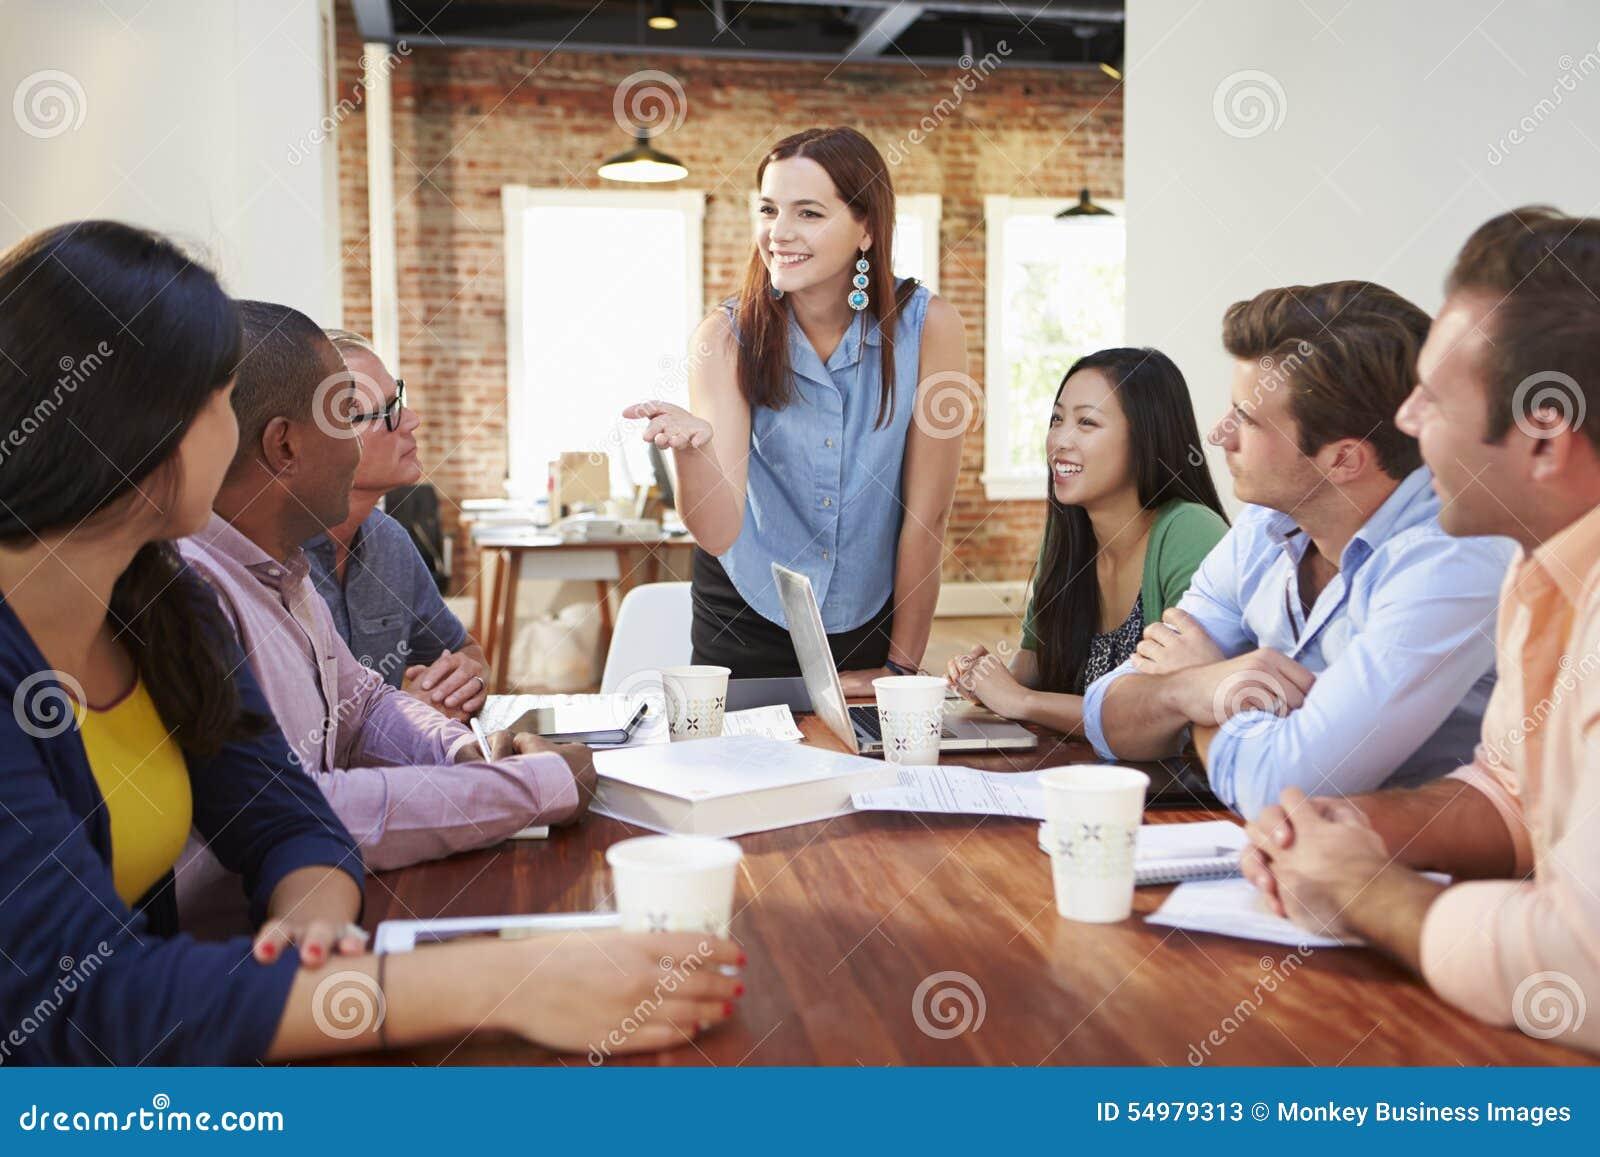 Chefe fêmea Addressing Office Workers na reunião